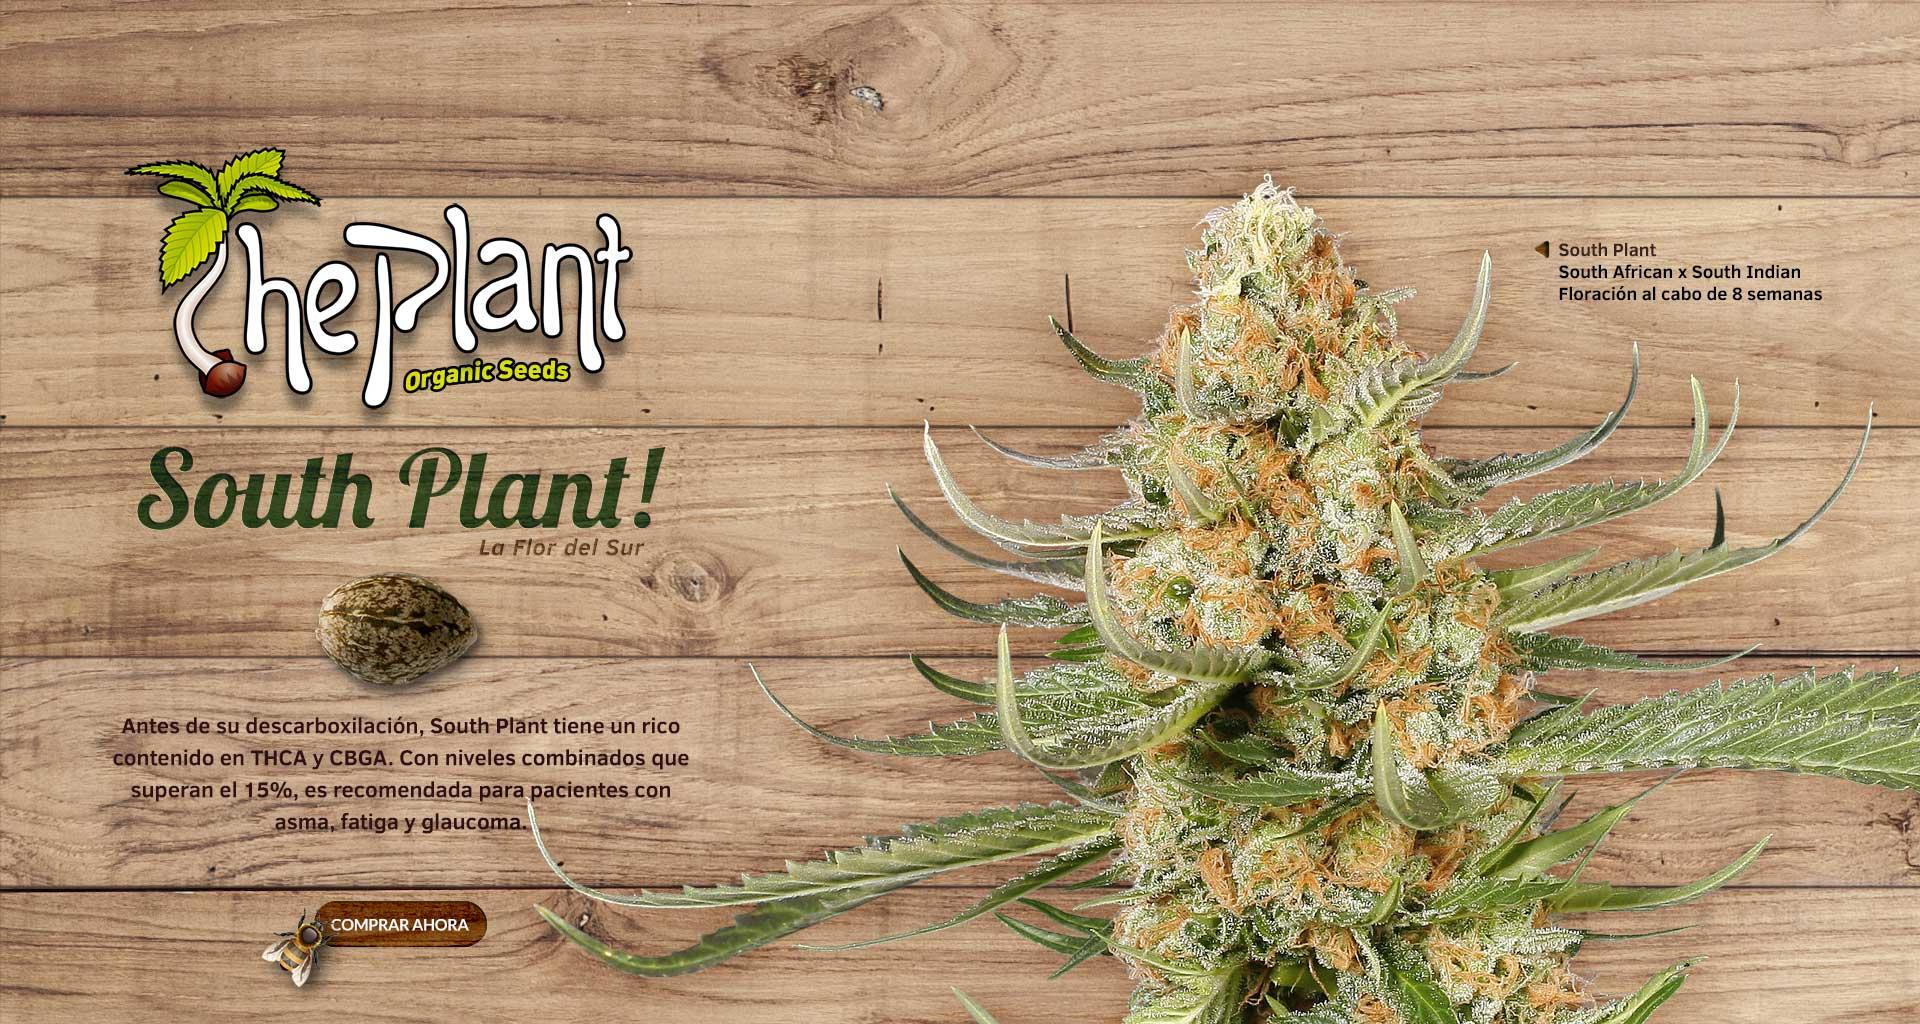 South Plant